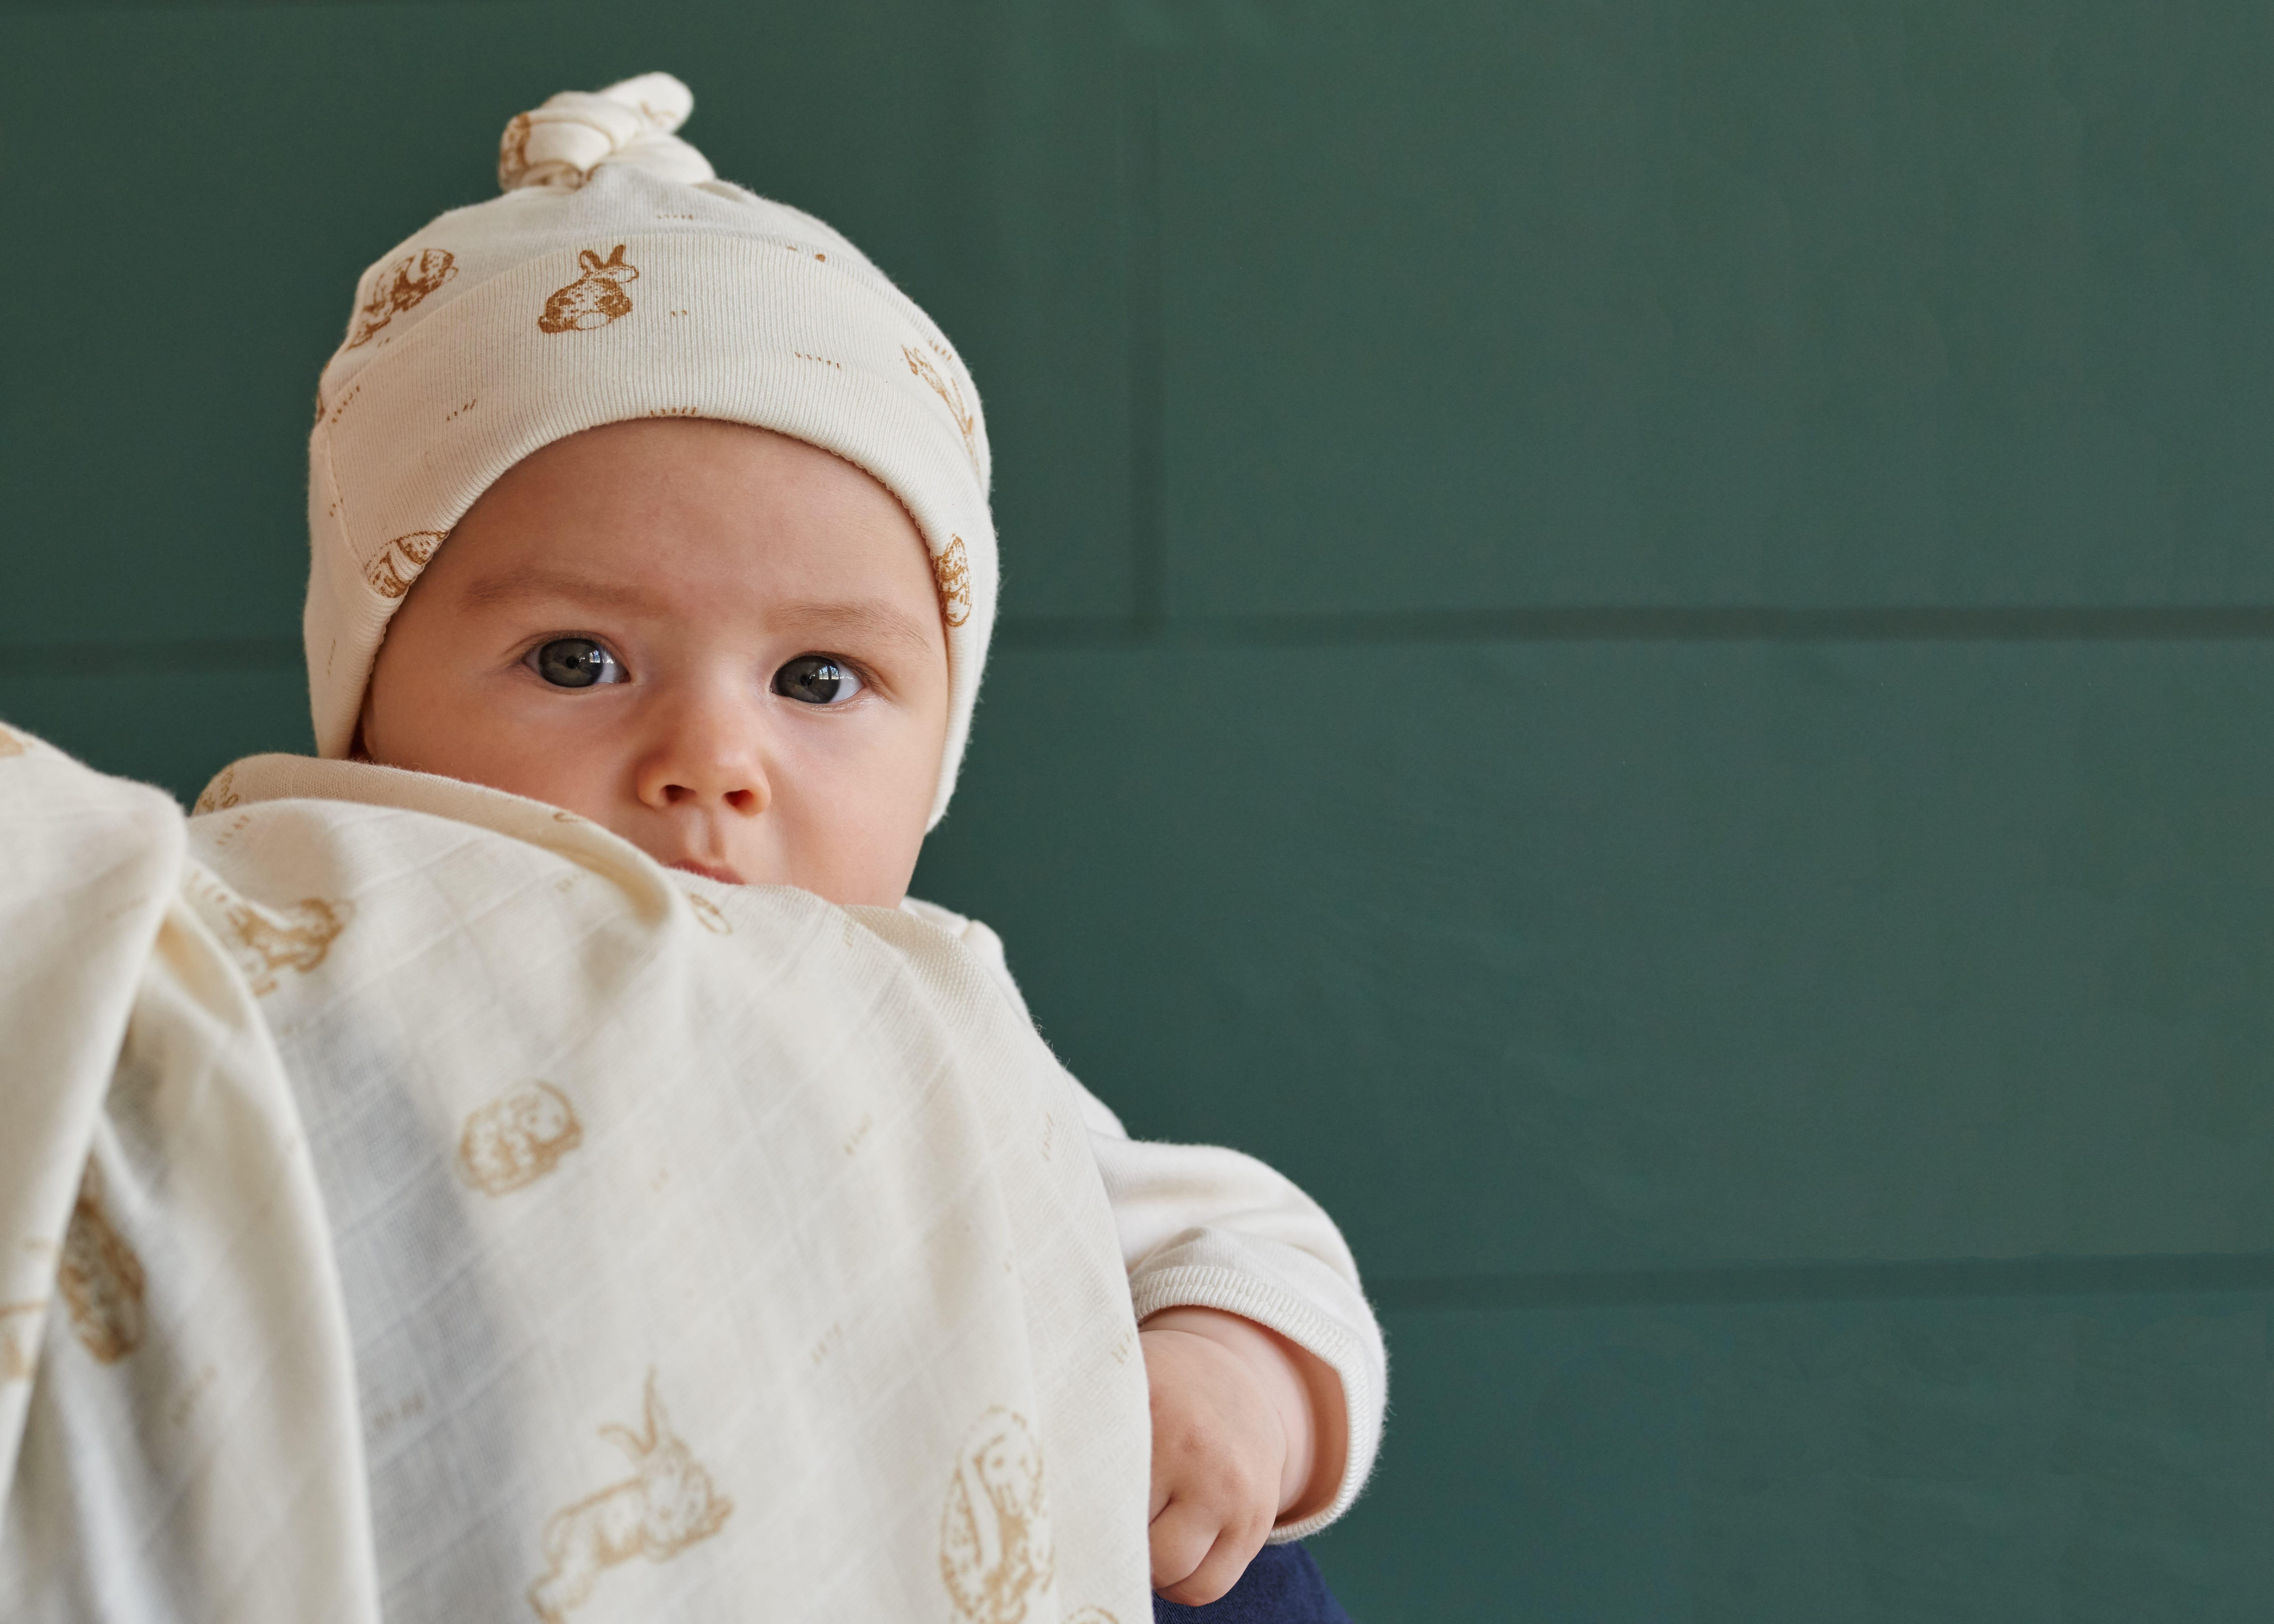 sharlene poole on winding your baby